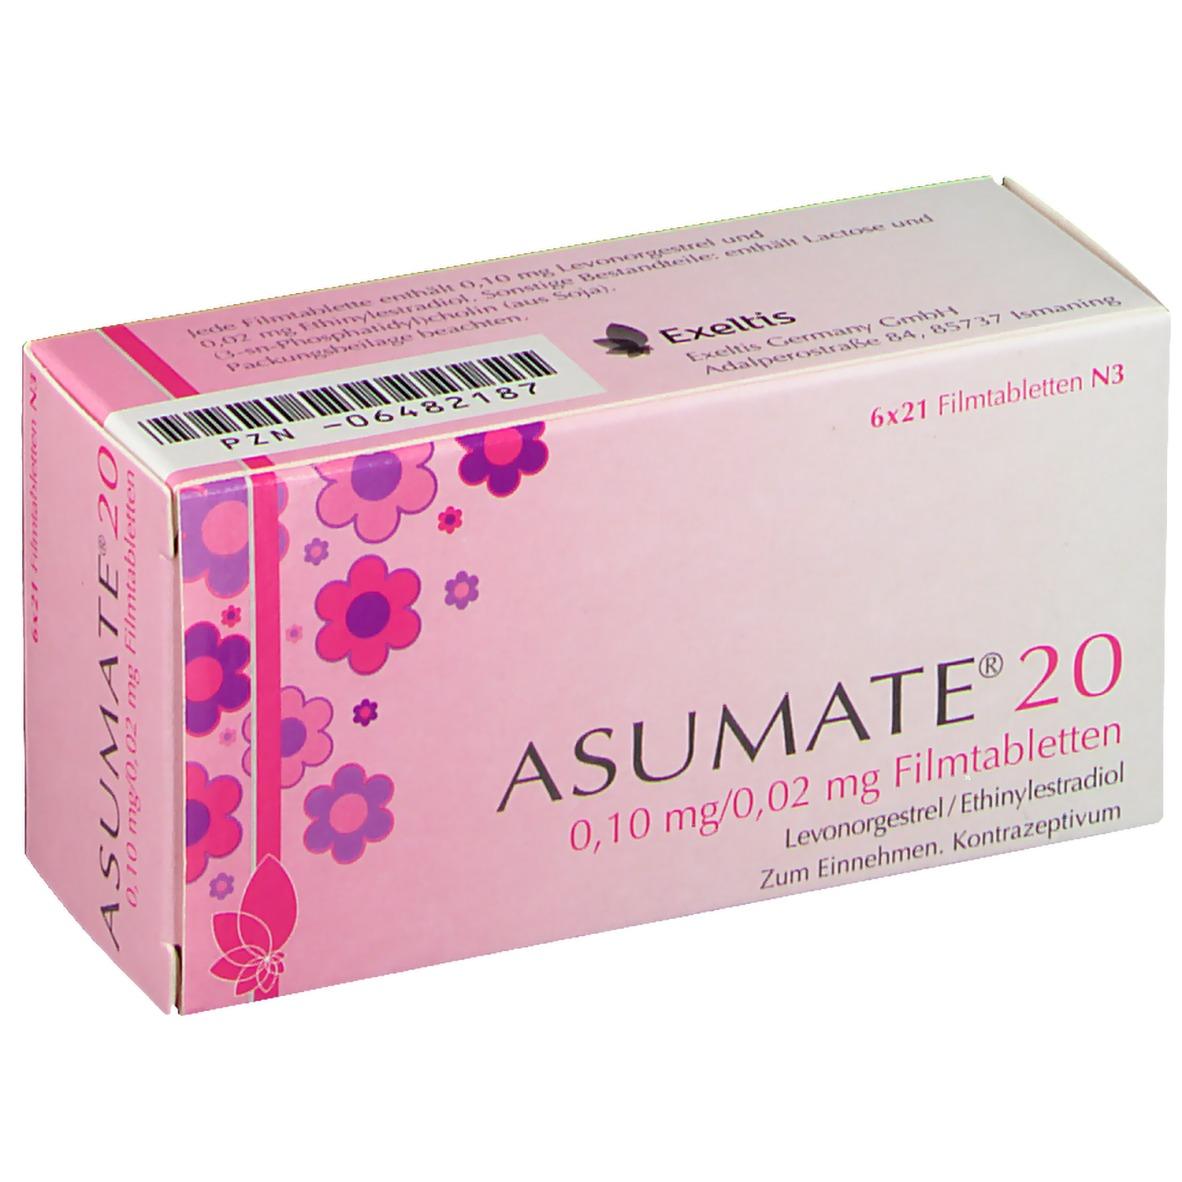 ASUMATE 20 0,10mg/0,02mg 6X21 St - shop-apotheke.com